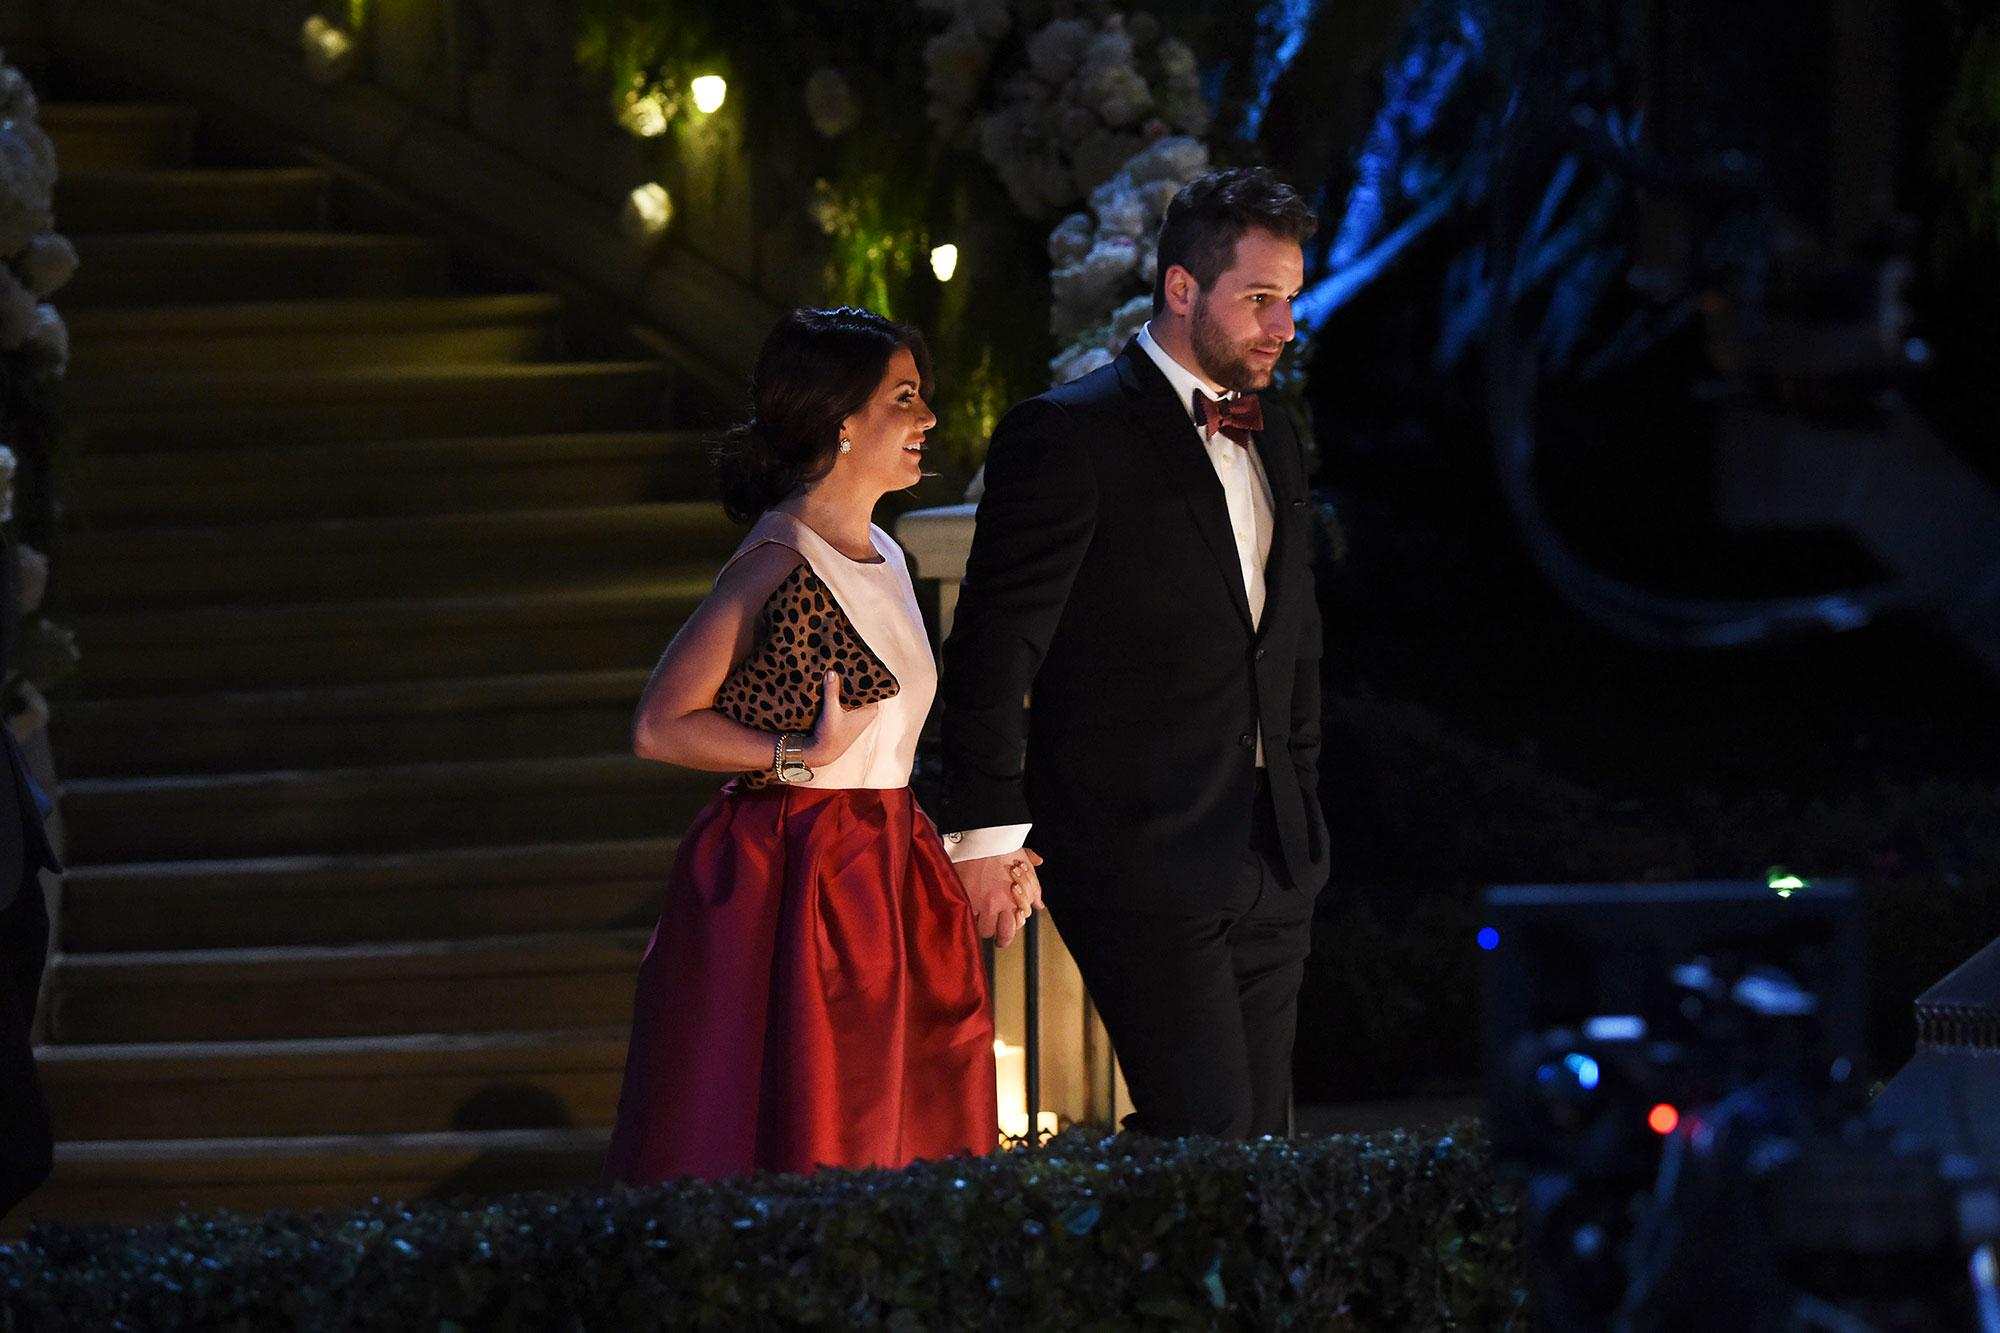 Jillian Harris and Justin Pasutto - Jillian Harris and Justin Pasutto (Photo by Matt Petit/ABC via Getty Images)